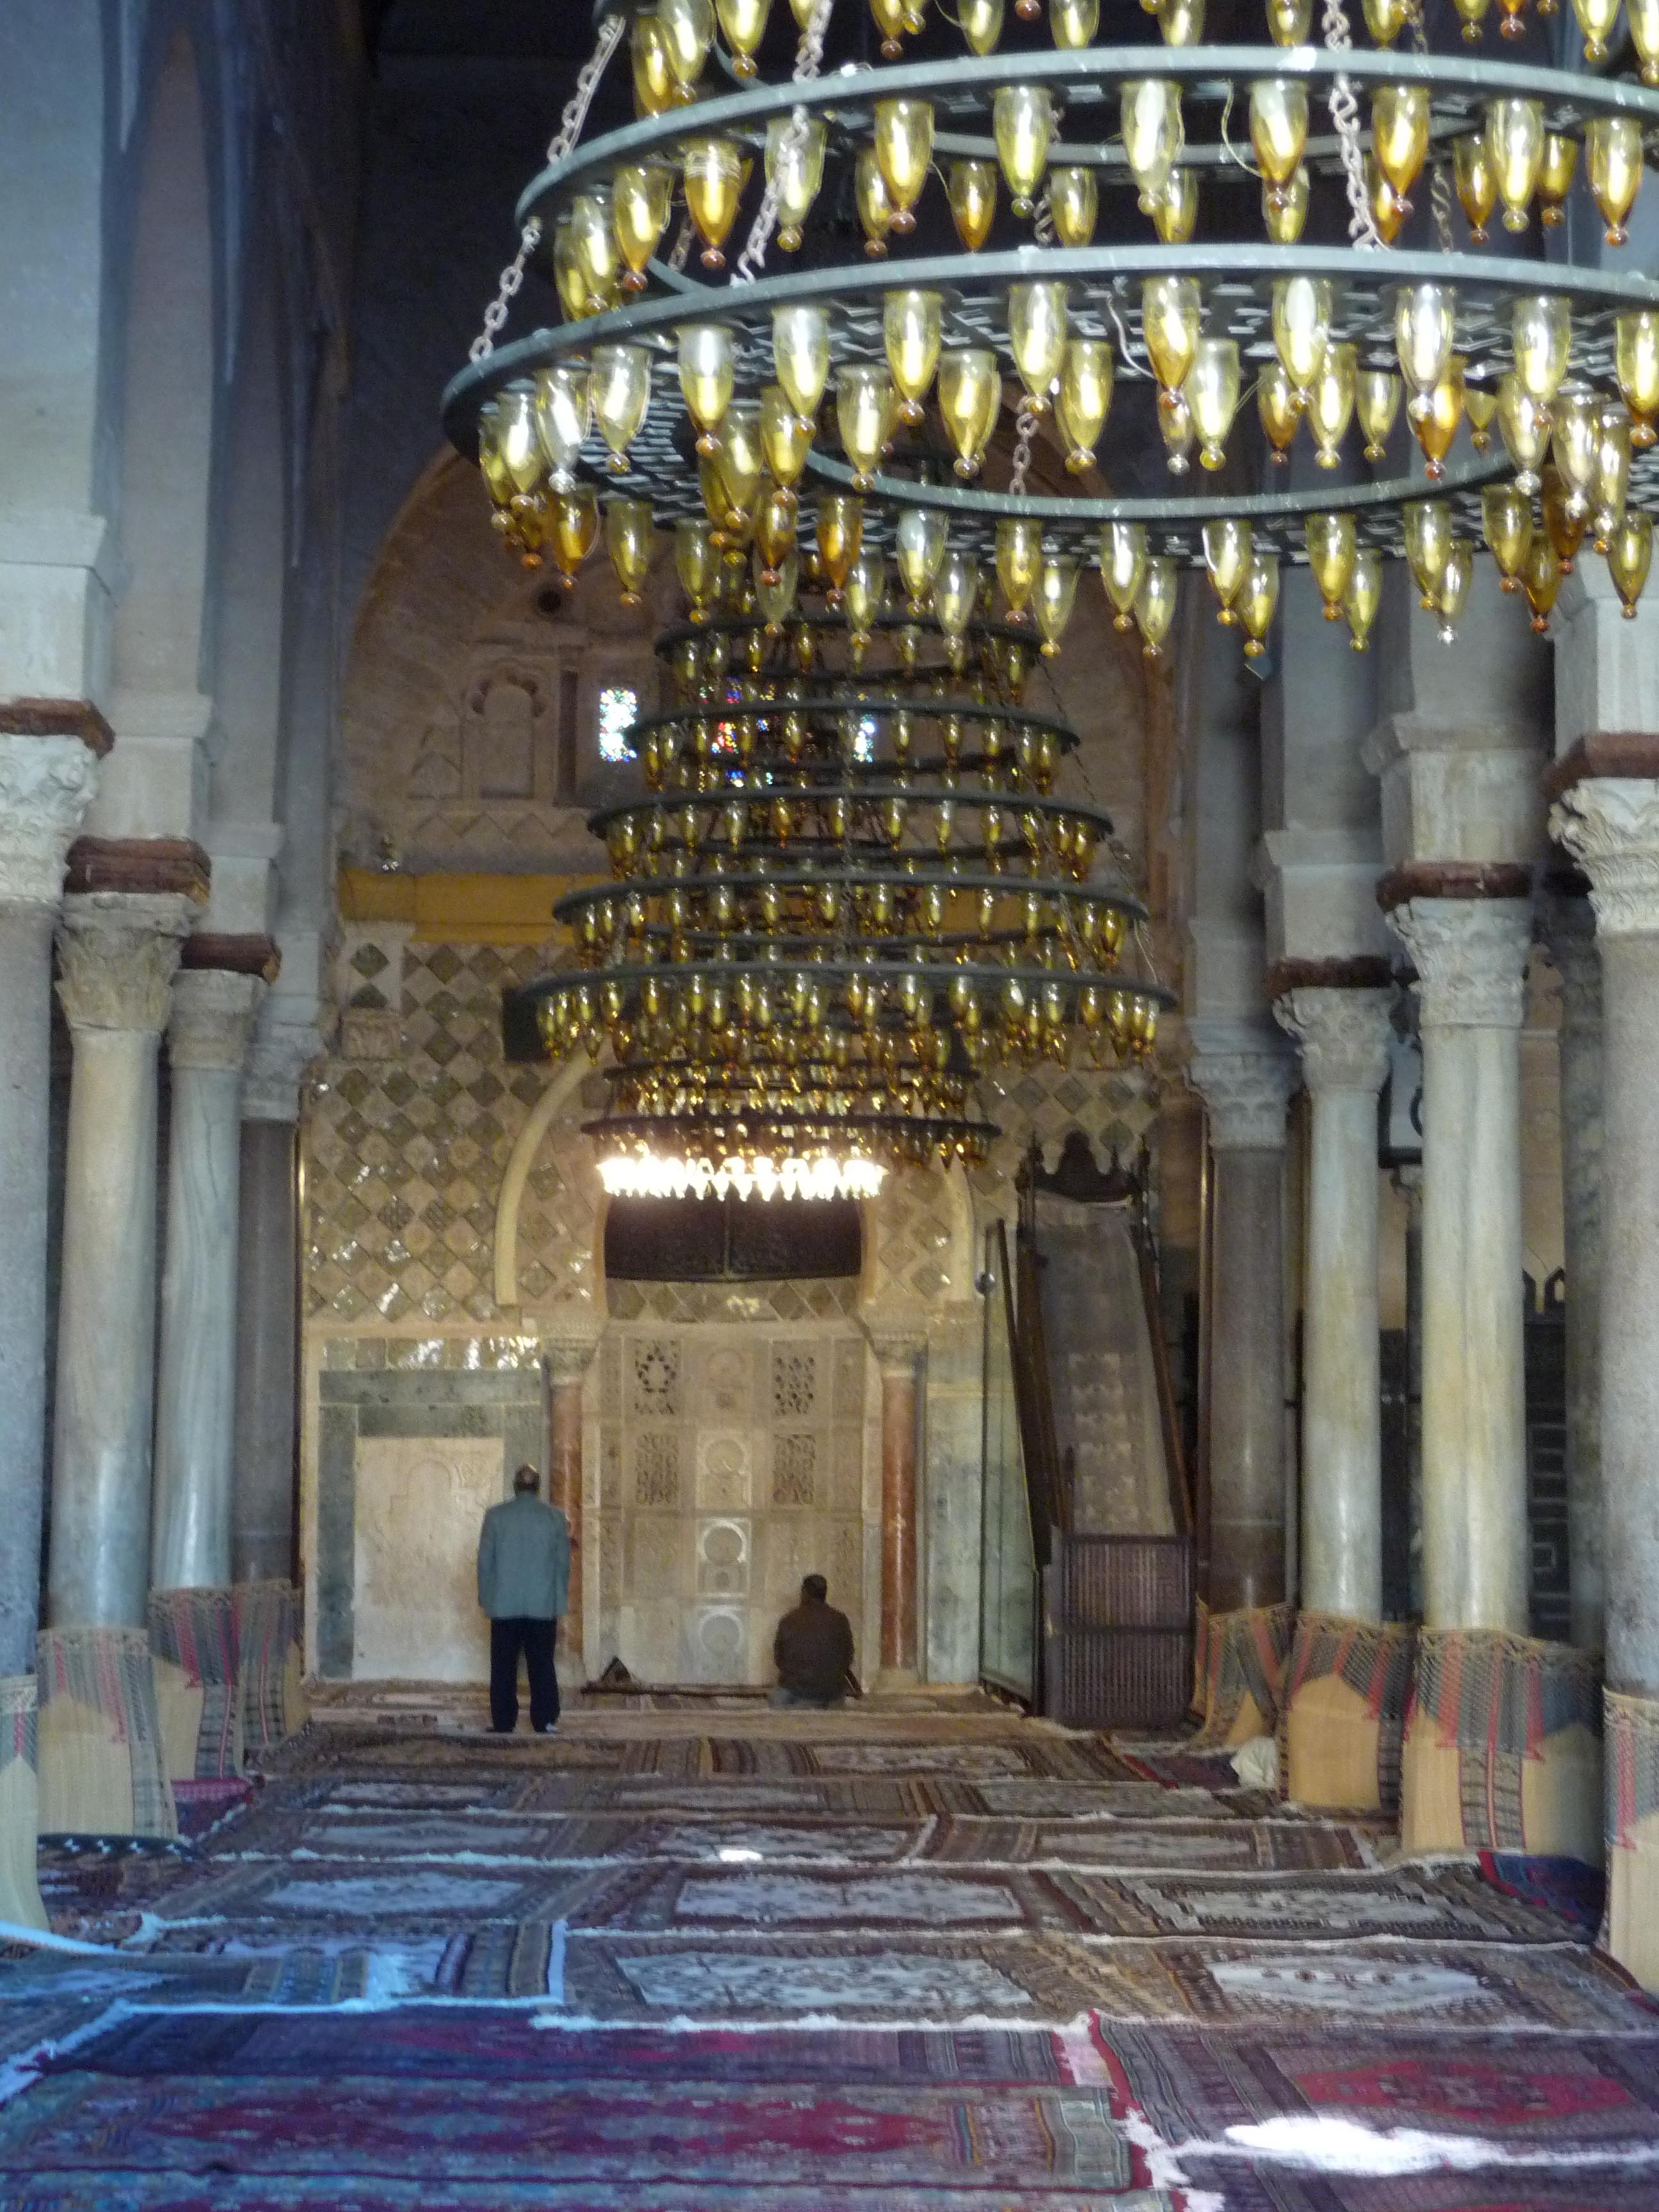 Great Mosque Kairouan Mihrab File:great Mosque of Kairouan